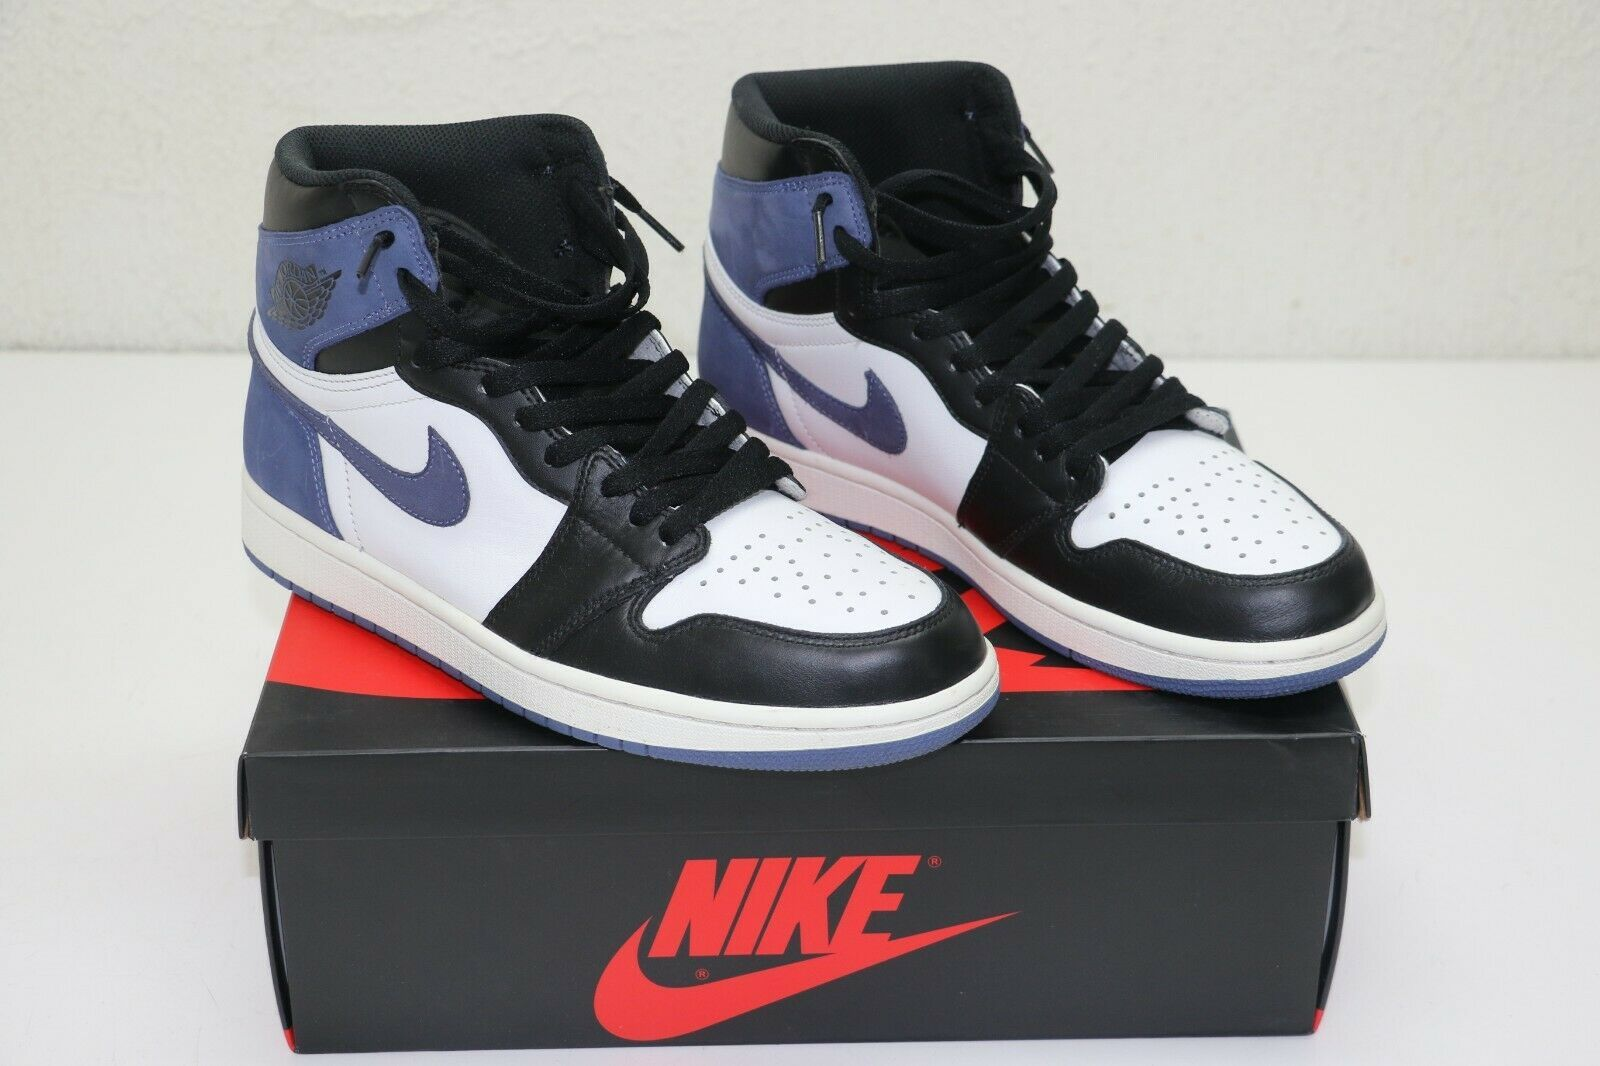 Nike Air Jordan 1 Retro Blue Moon Style 555088 115 Size 9 5